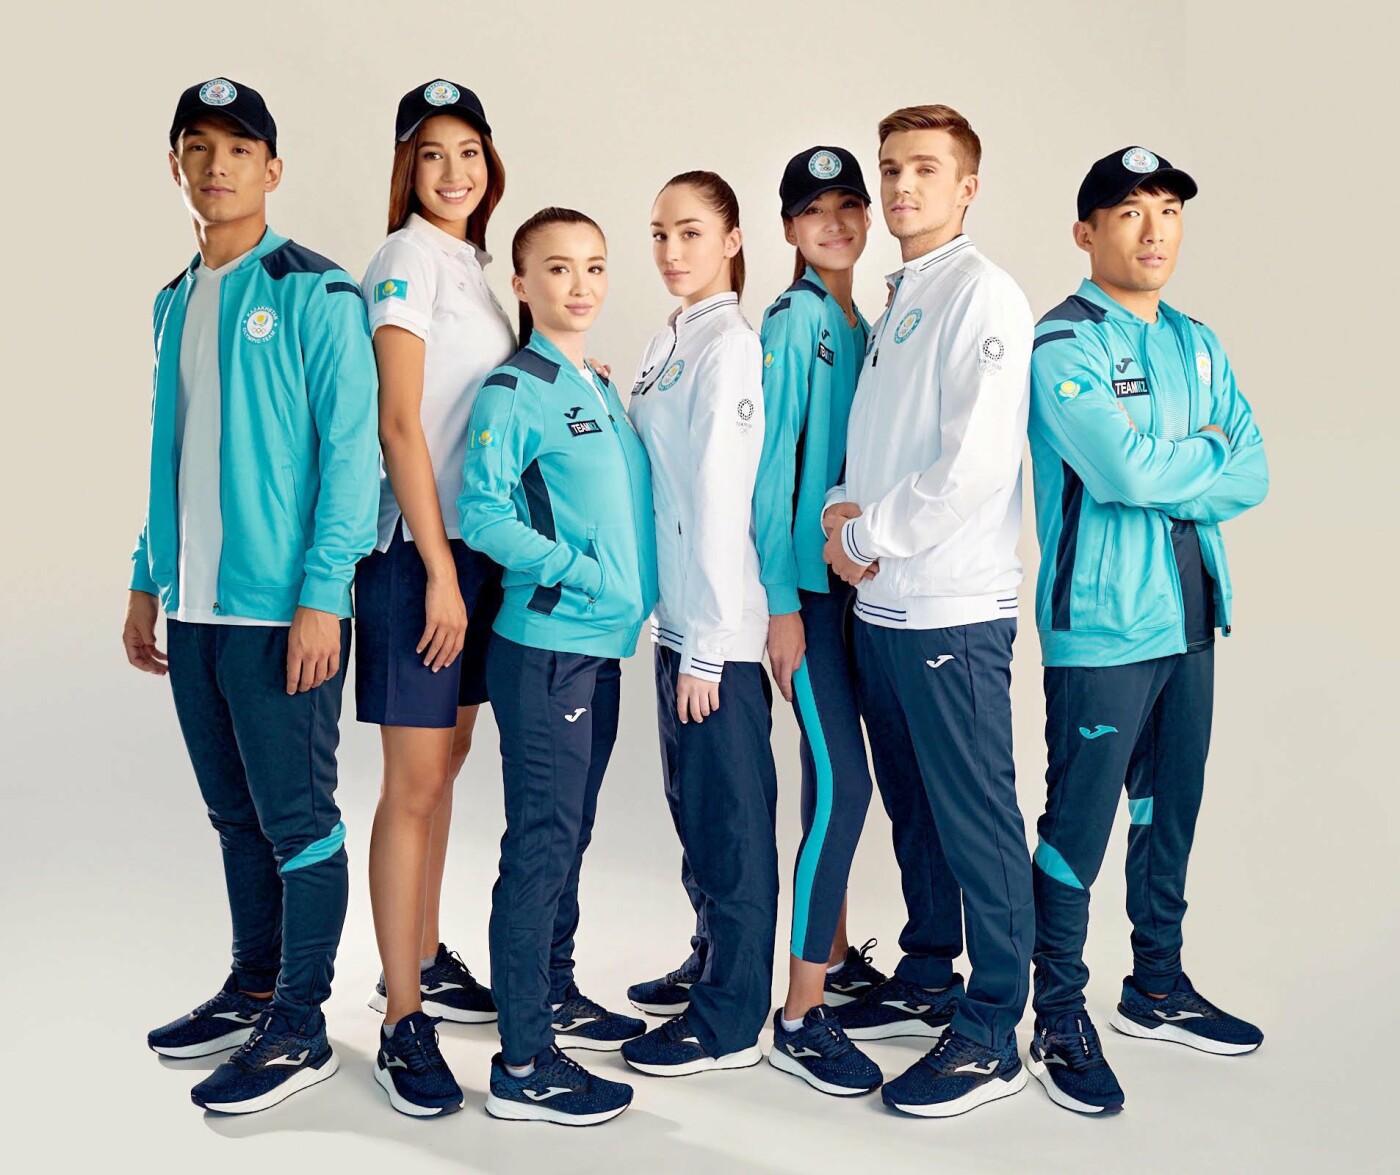 Новую олимпийскую форму казахстанских спортсменов представил НОК, фото-1